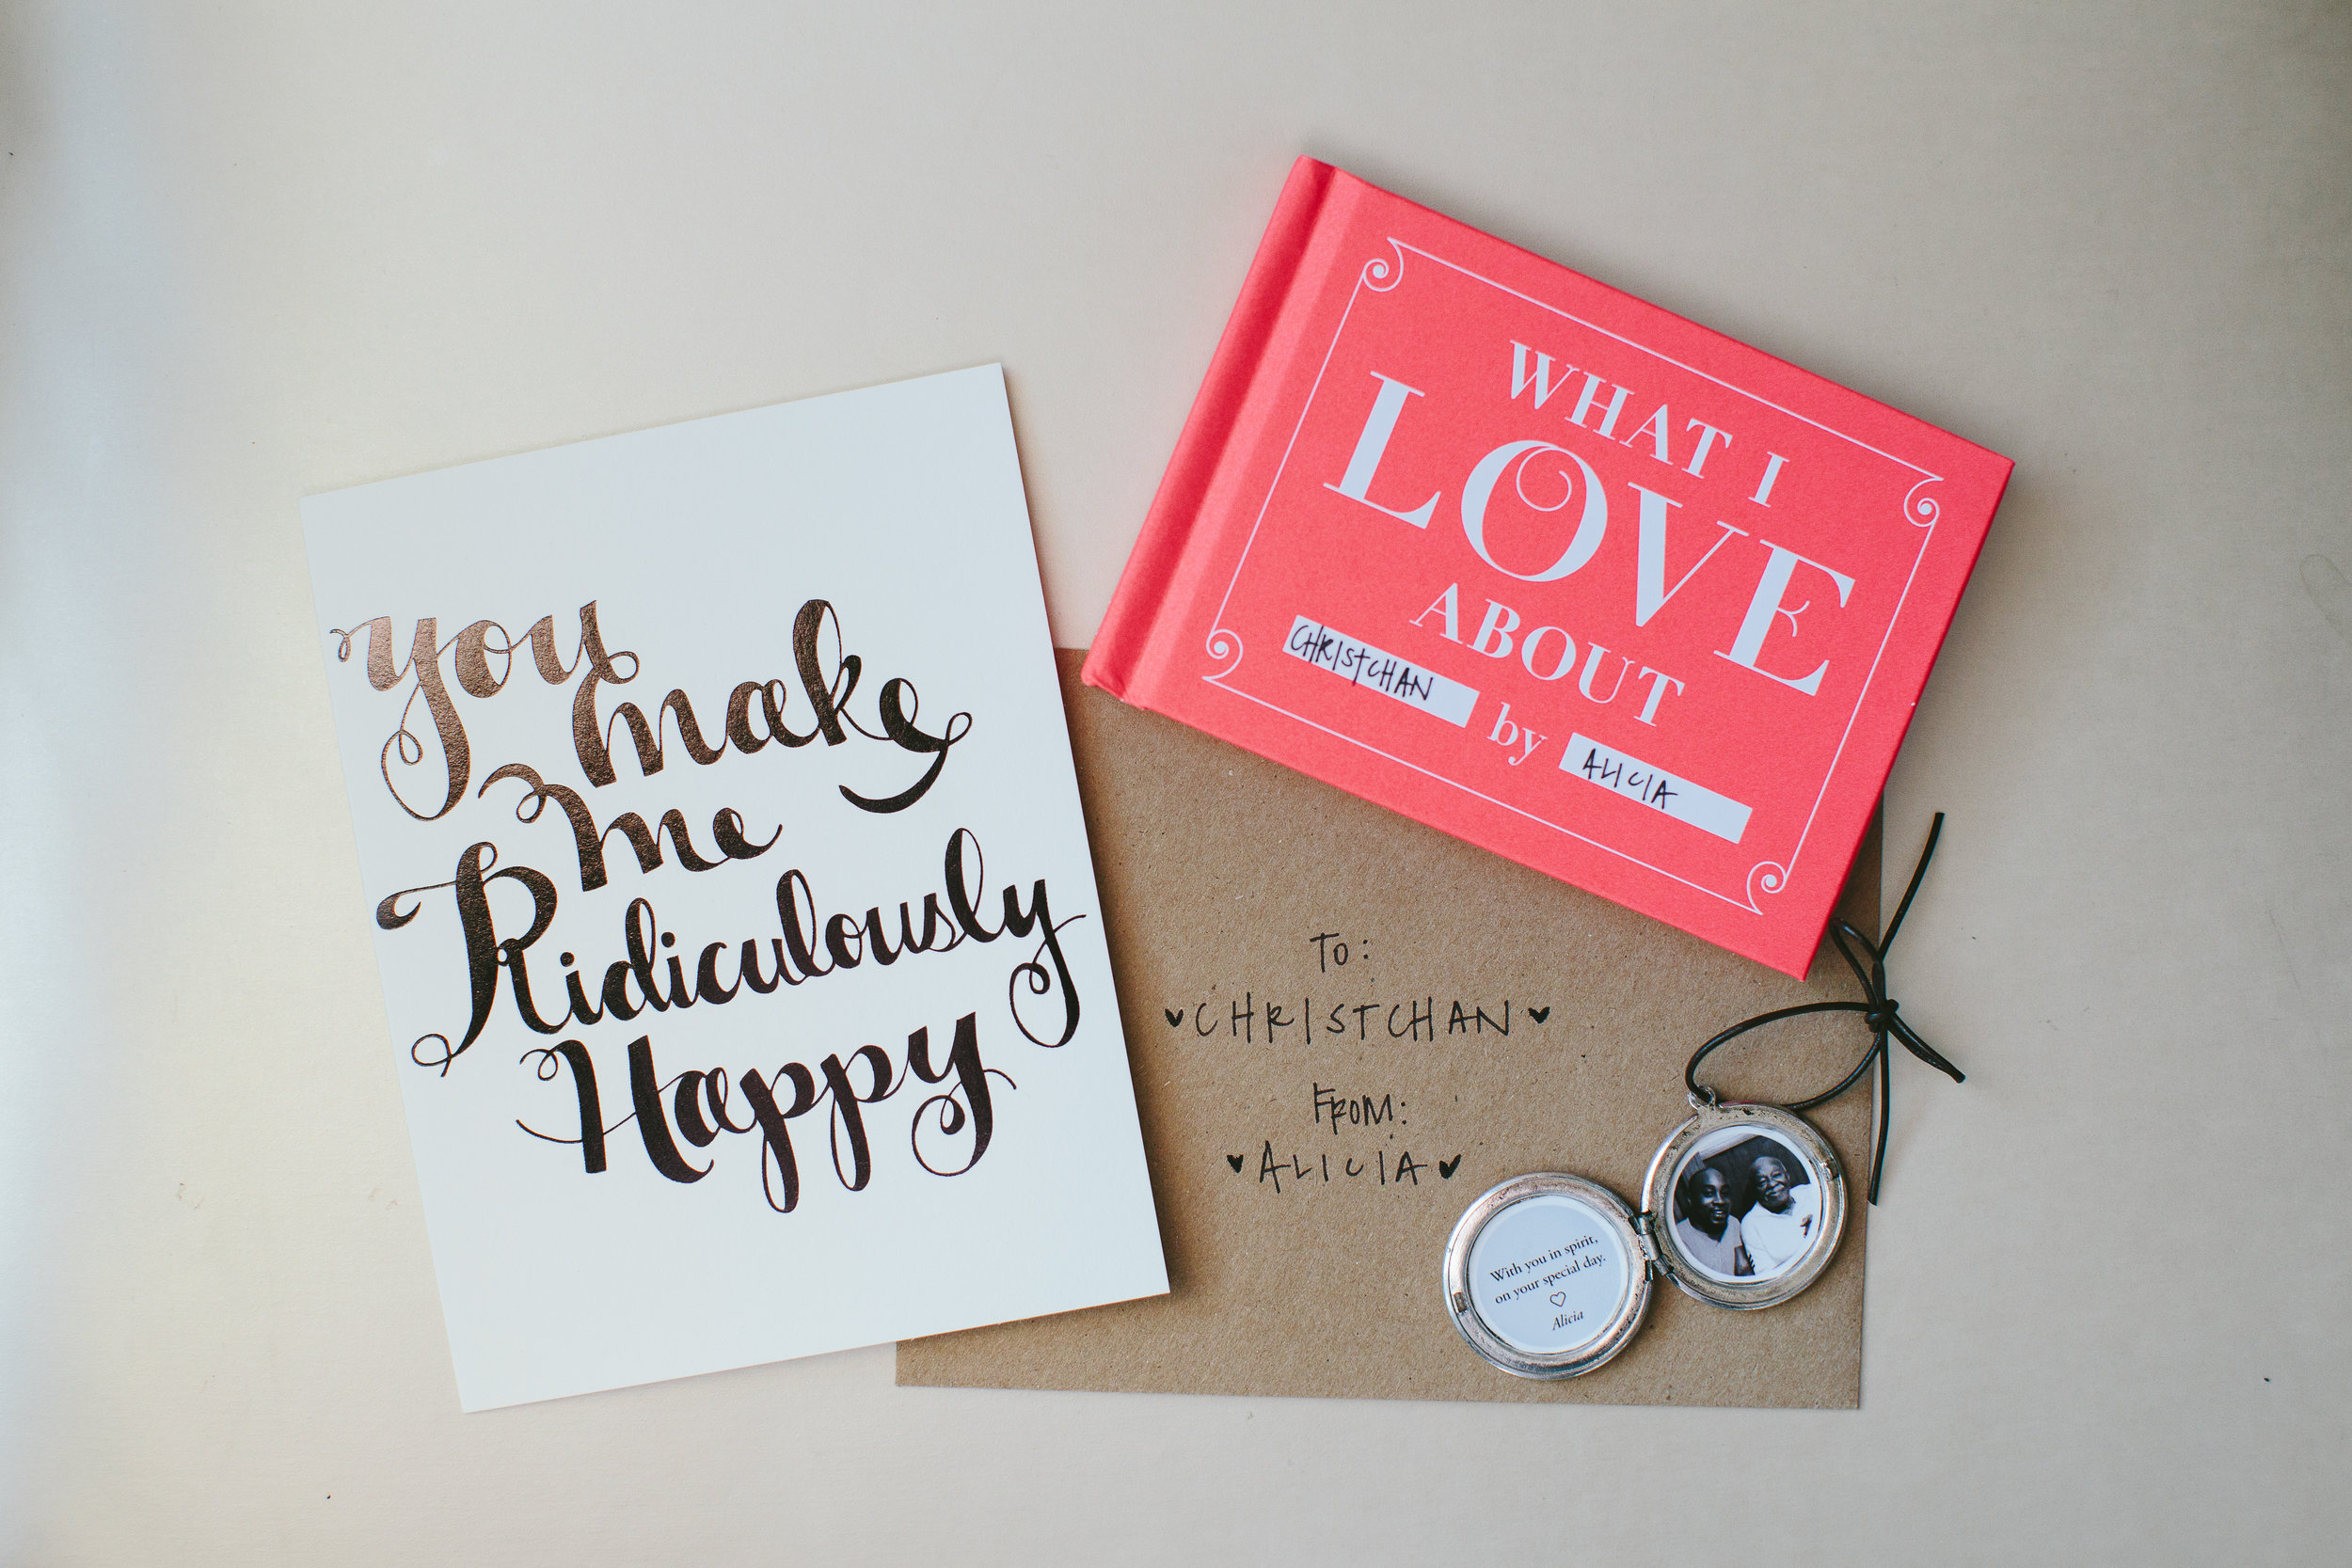 bride and groom's gifts, wedding details | atlanta wedding planners